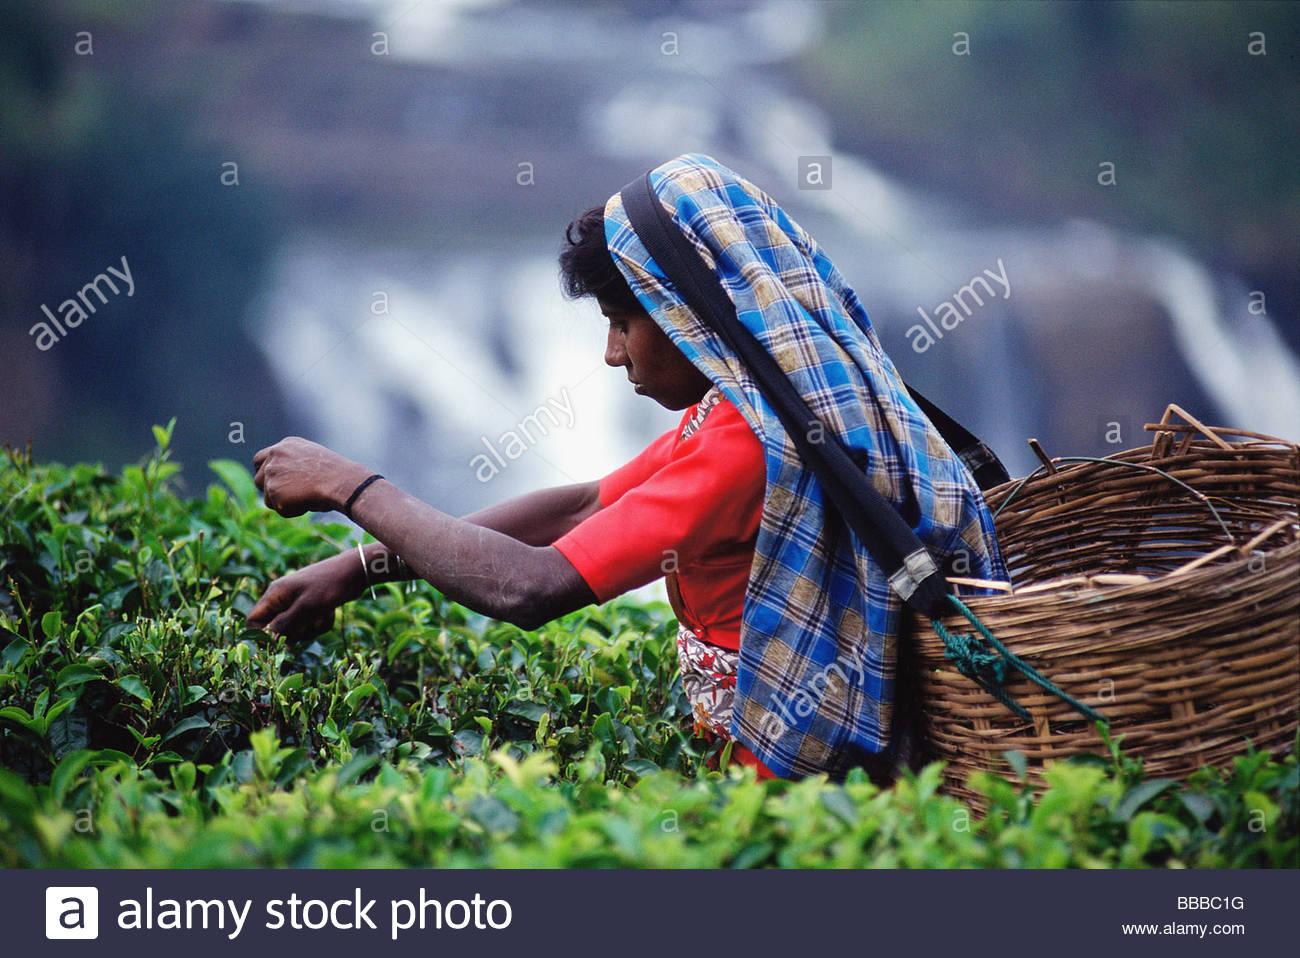 Sri Lanka, Talawakele, Woman picking tea in front of St. Clairs waterfall - Stock Image